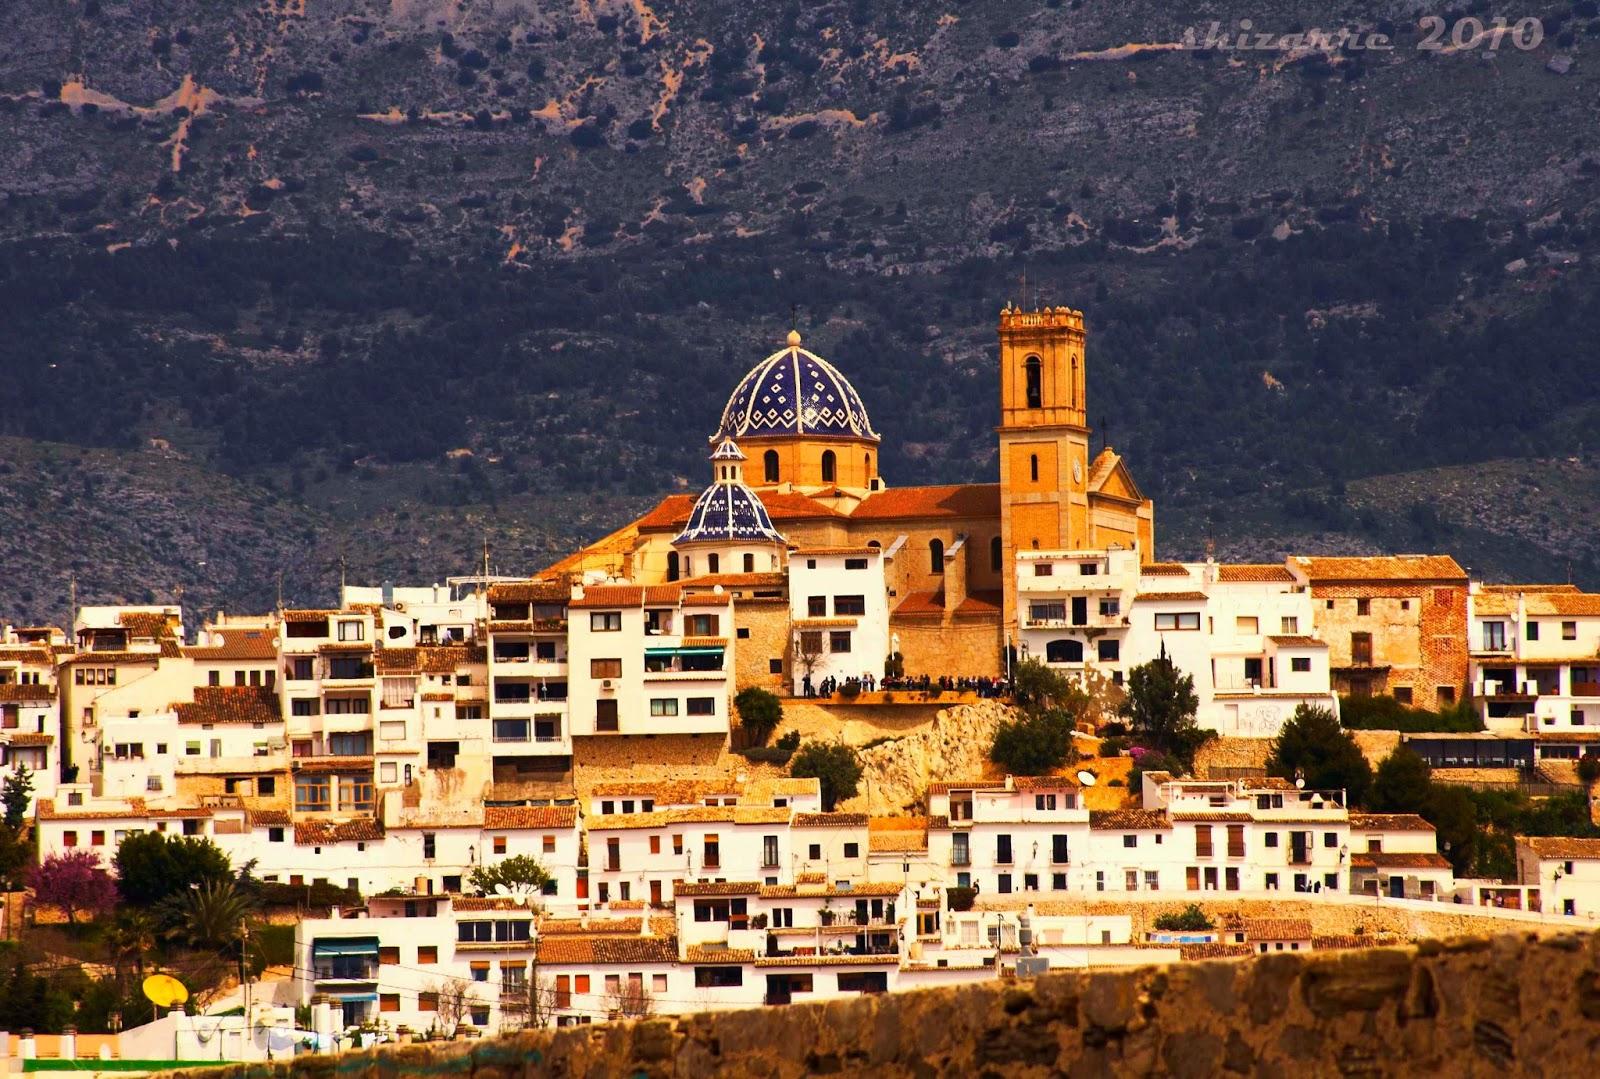 Spanje excursies altea strand en historie - Altea alicante fotos ...